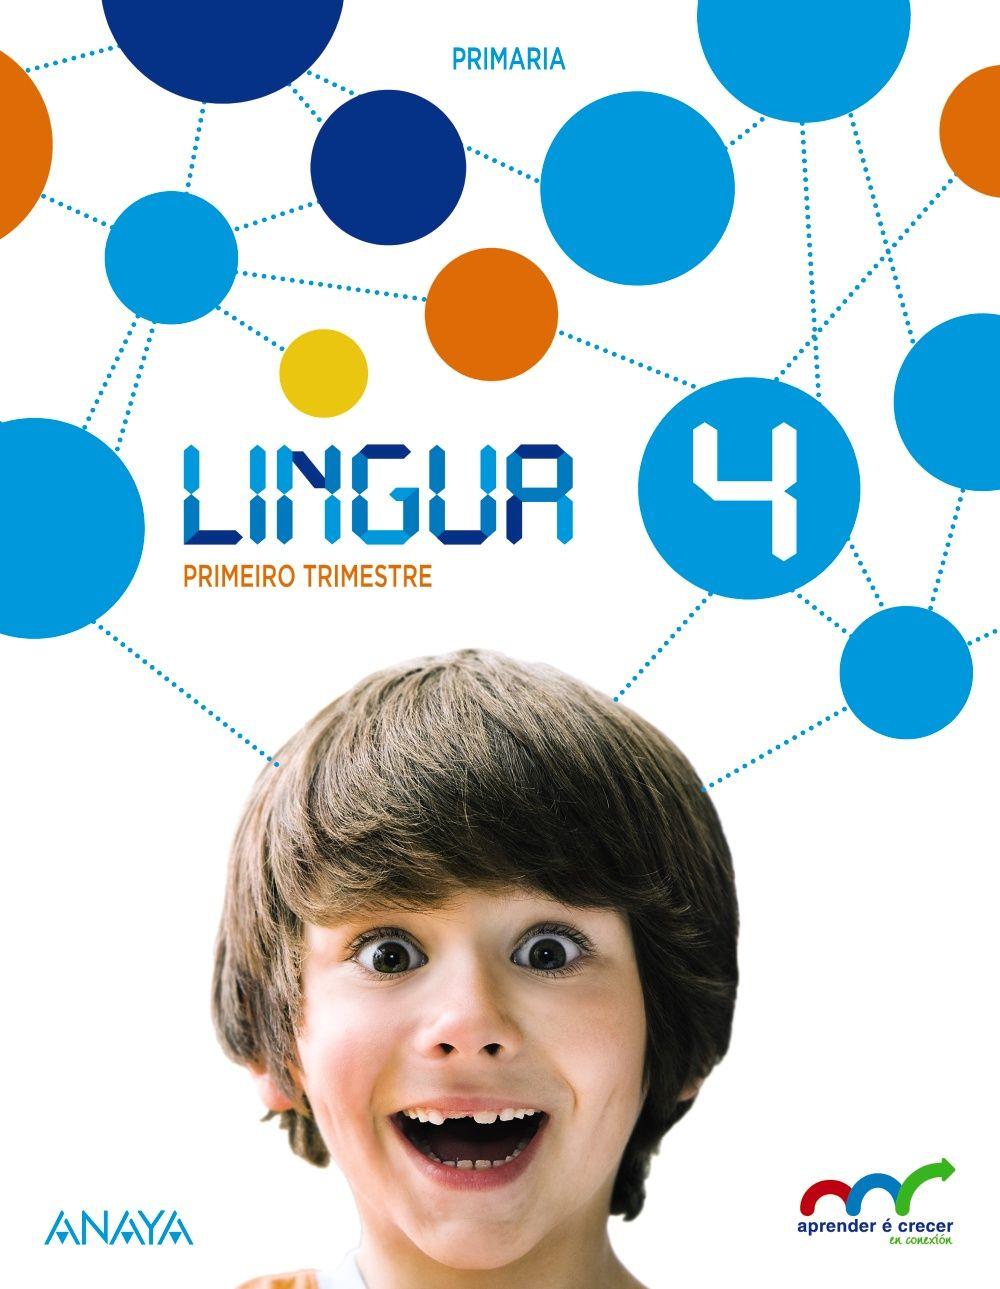 Lingua Galega 4 Cuarto de Primaria en Galego Primeiro Trimestre ...